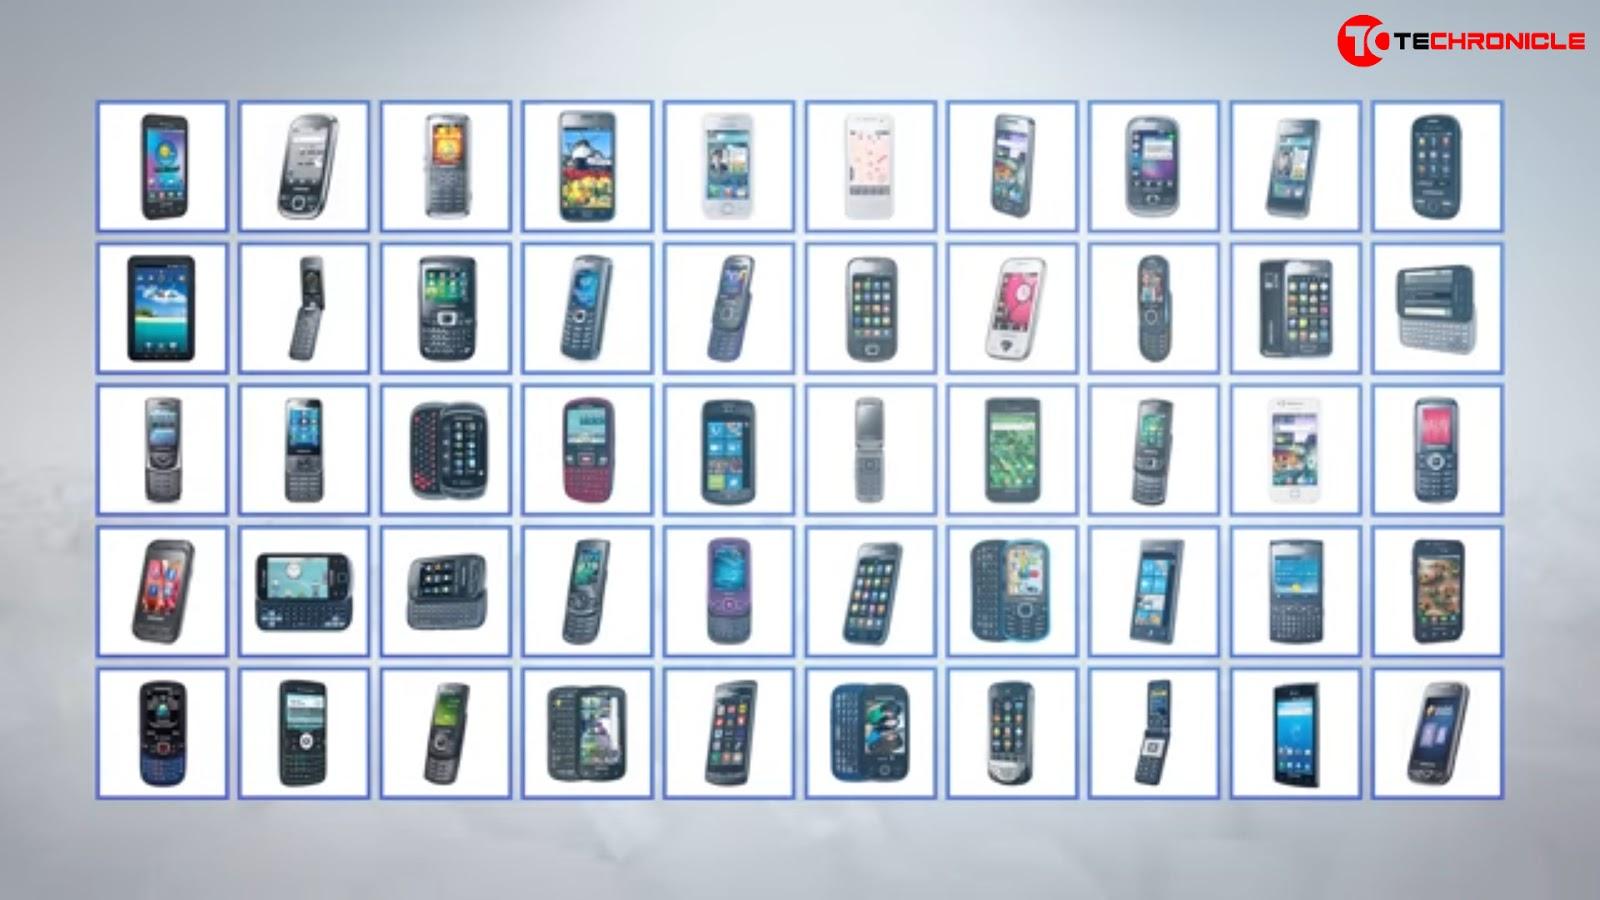 Samsung All Phones Techronicle